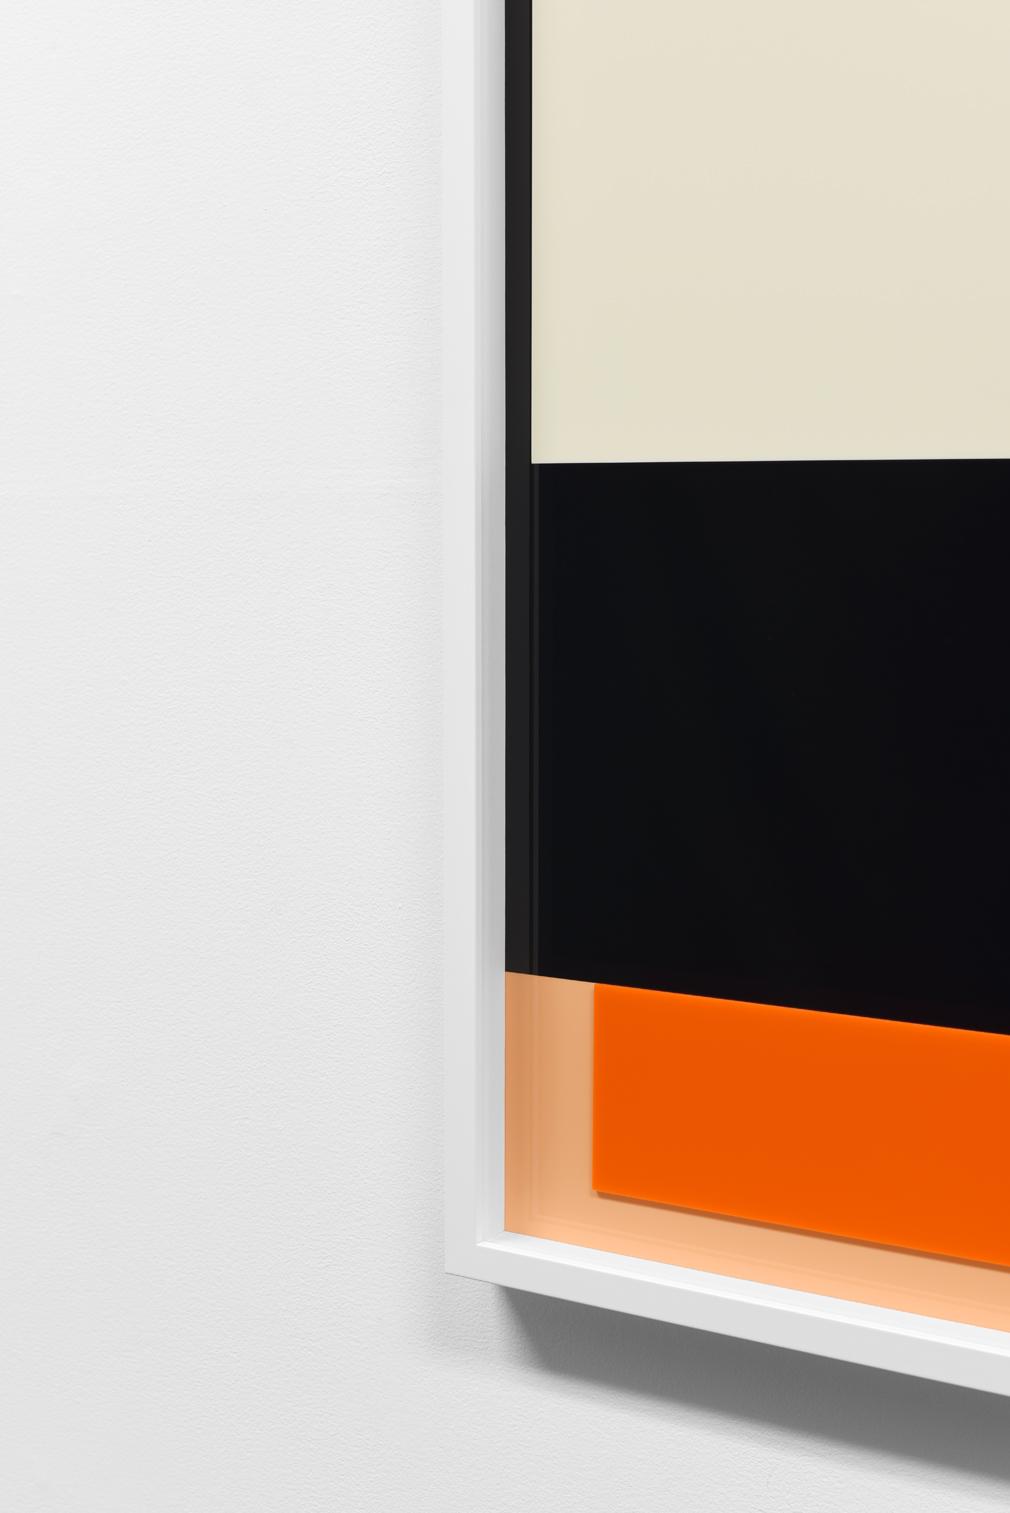 Dan McCabe  | Joiner Series: -34.374938, 118.255348 Acrylic sheeting on Alubond in custom frames, 2018 87 x 62 x 4 cm  Courtesy of Murdoch University Art Collection, Perth, Western Australia